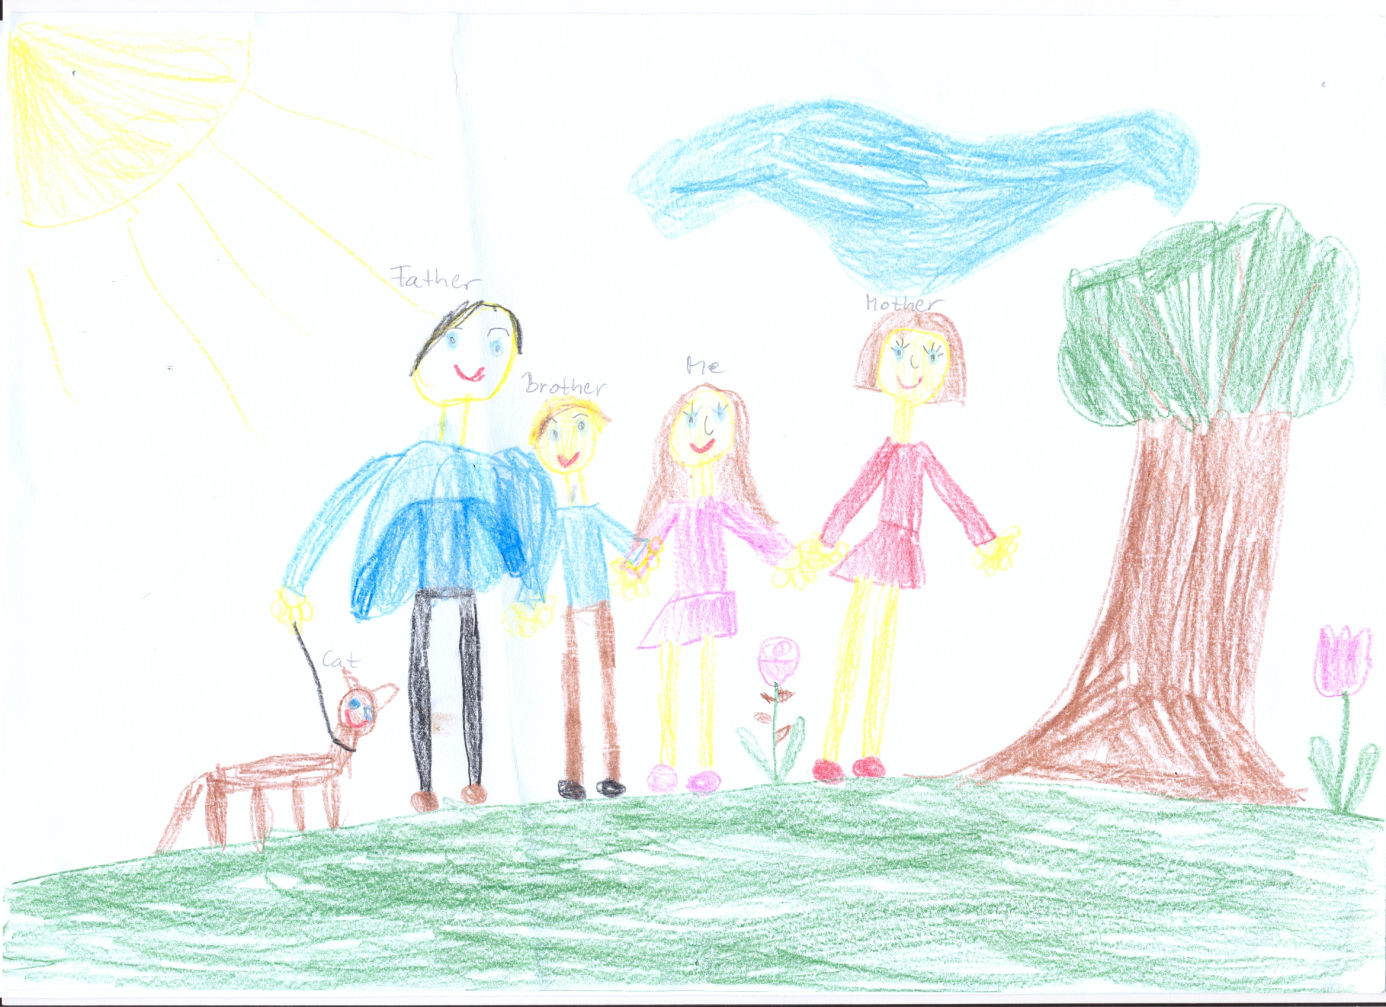 six year old drawing - Google Search | Aurora sleeping ...